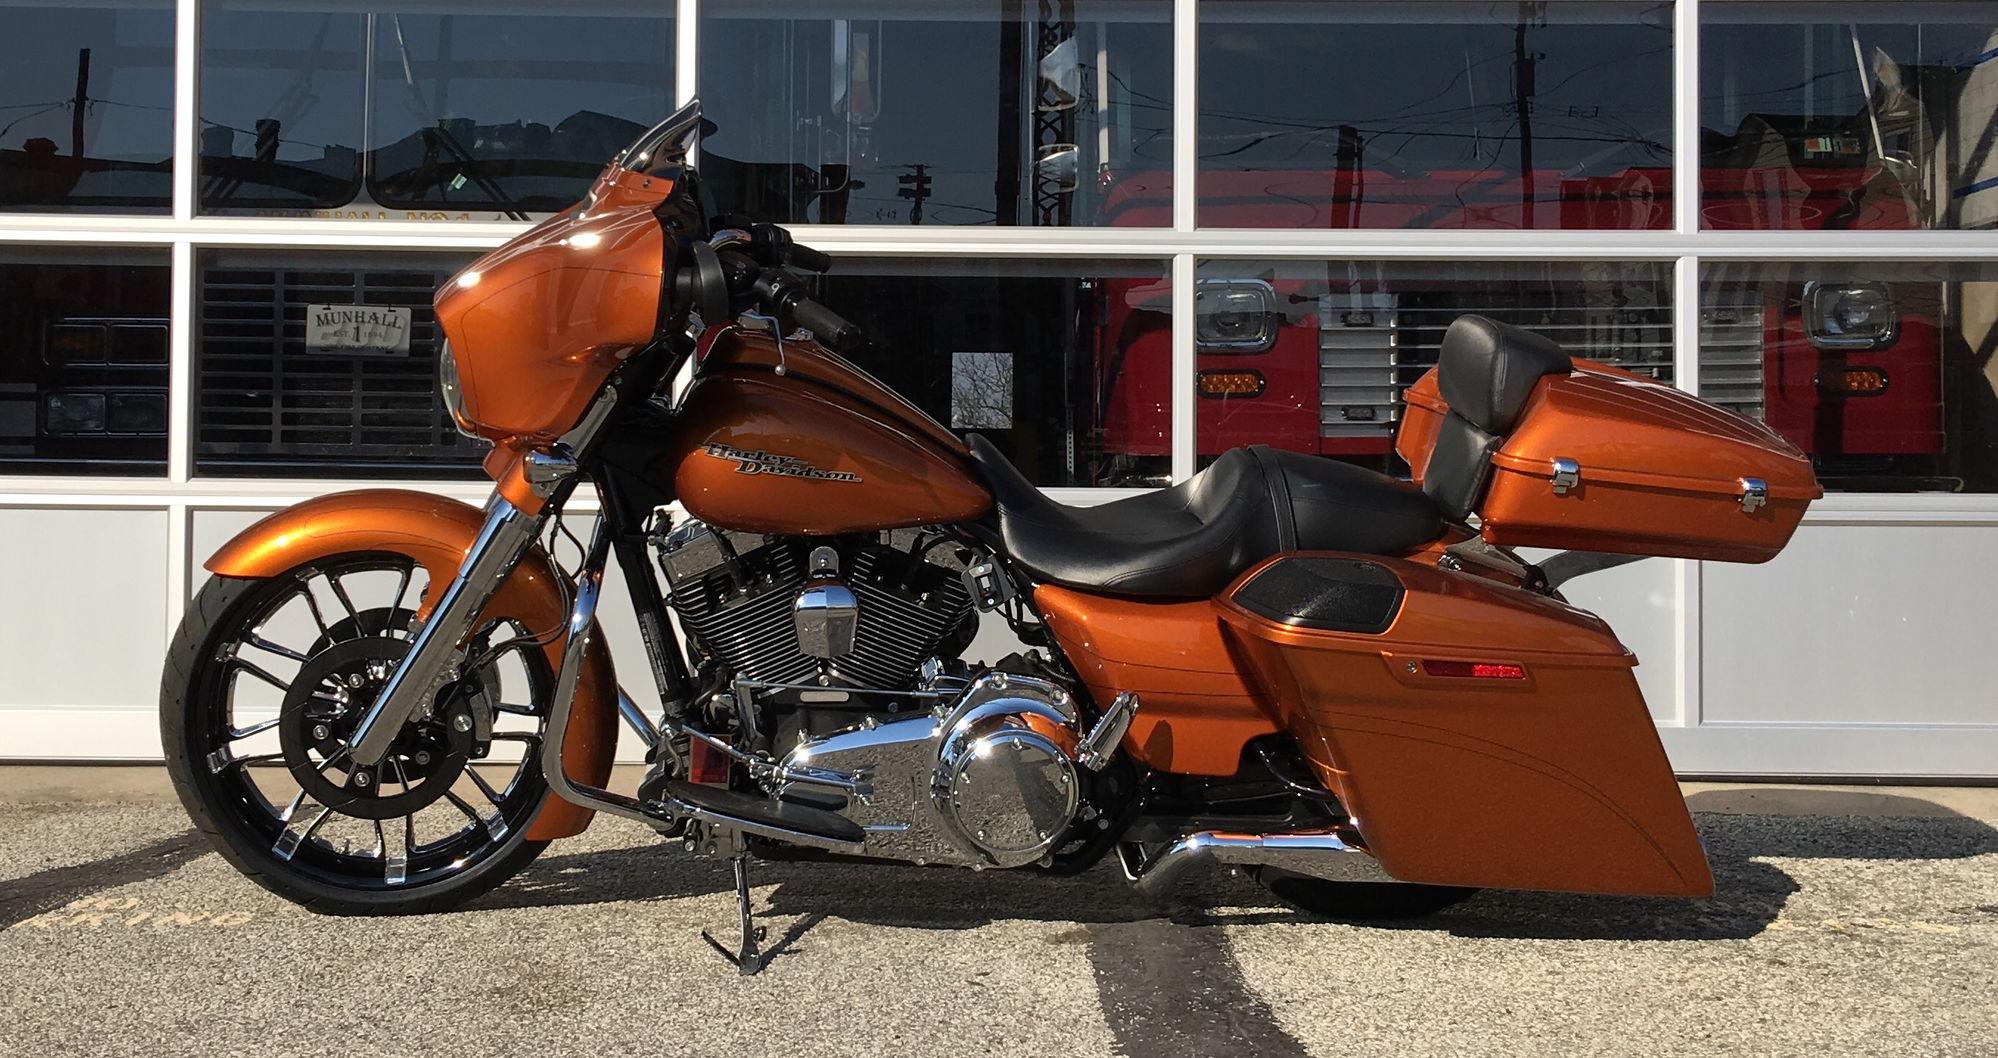 Harley Davidson Razor Tour Pack